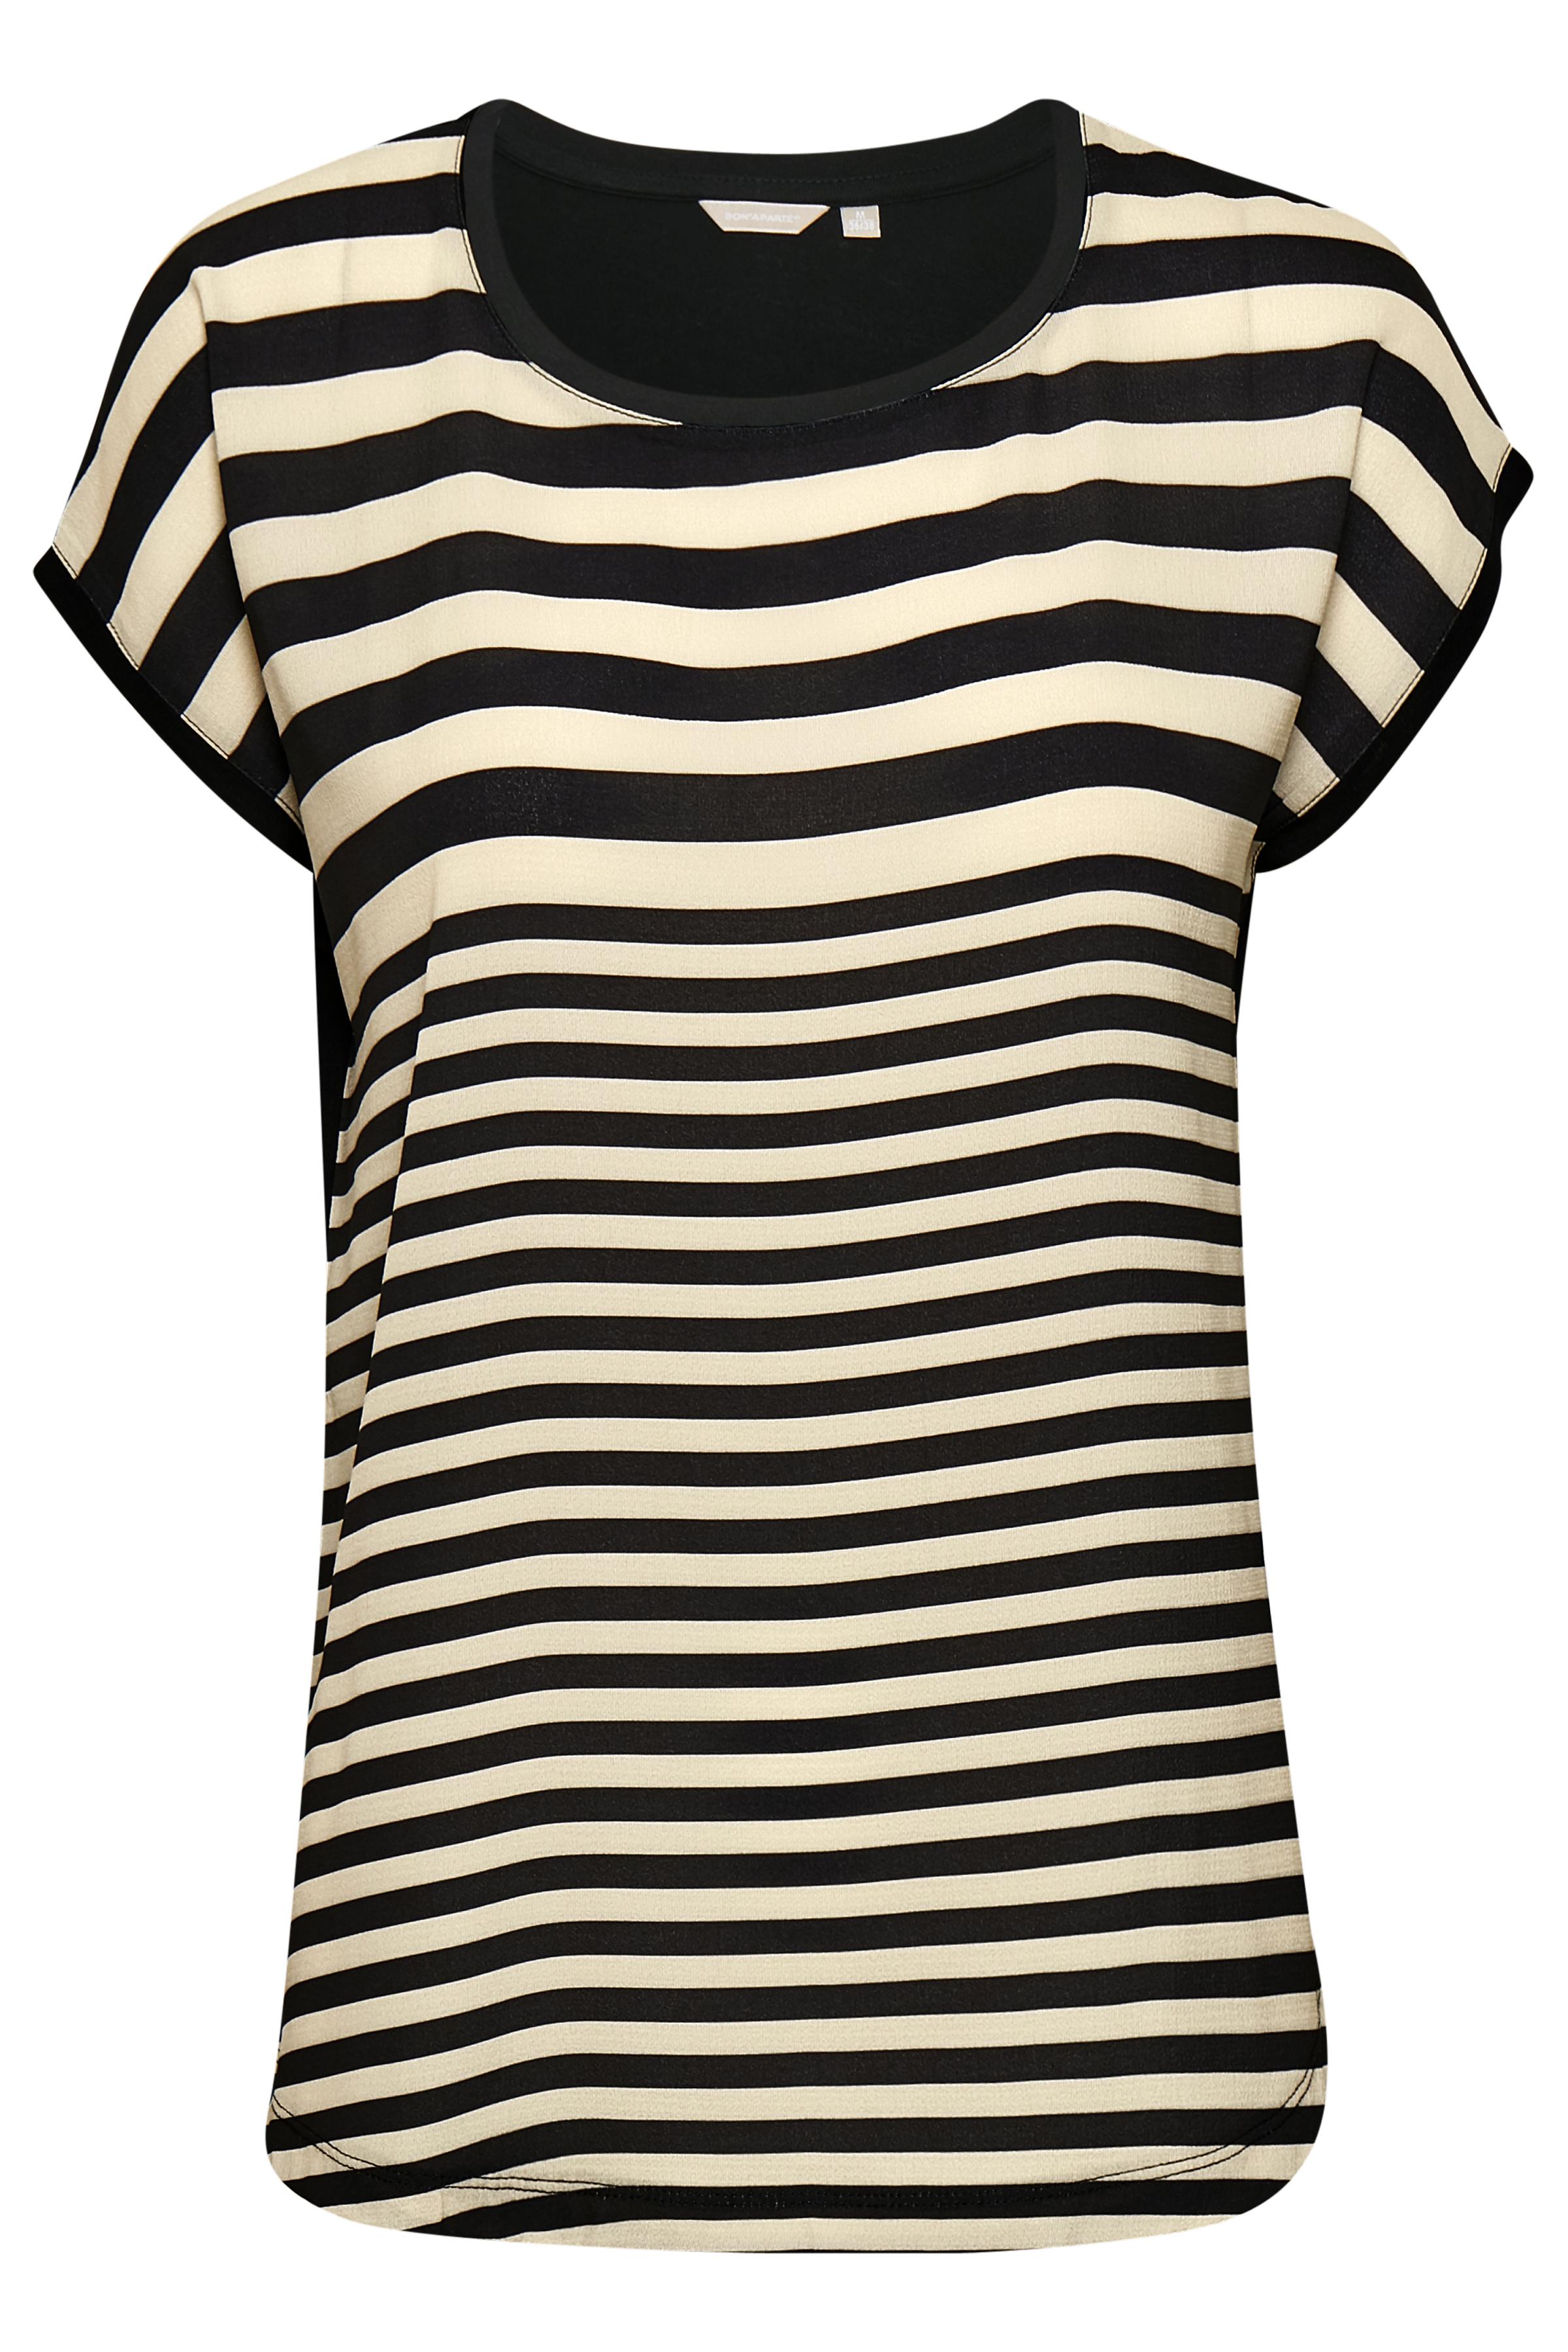 Zand/zwart Korte mouwen shirt  van Bon'A Parte – Door Zand/zwart Korte mouwen shirt  van maat. S-2XL hier